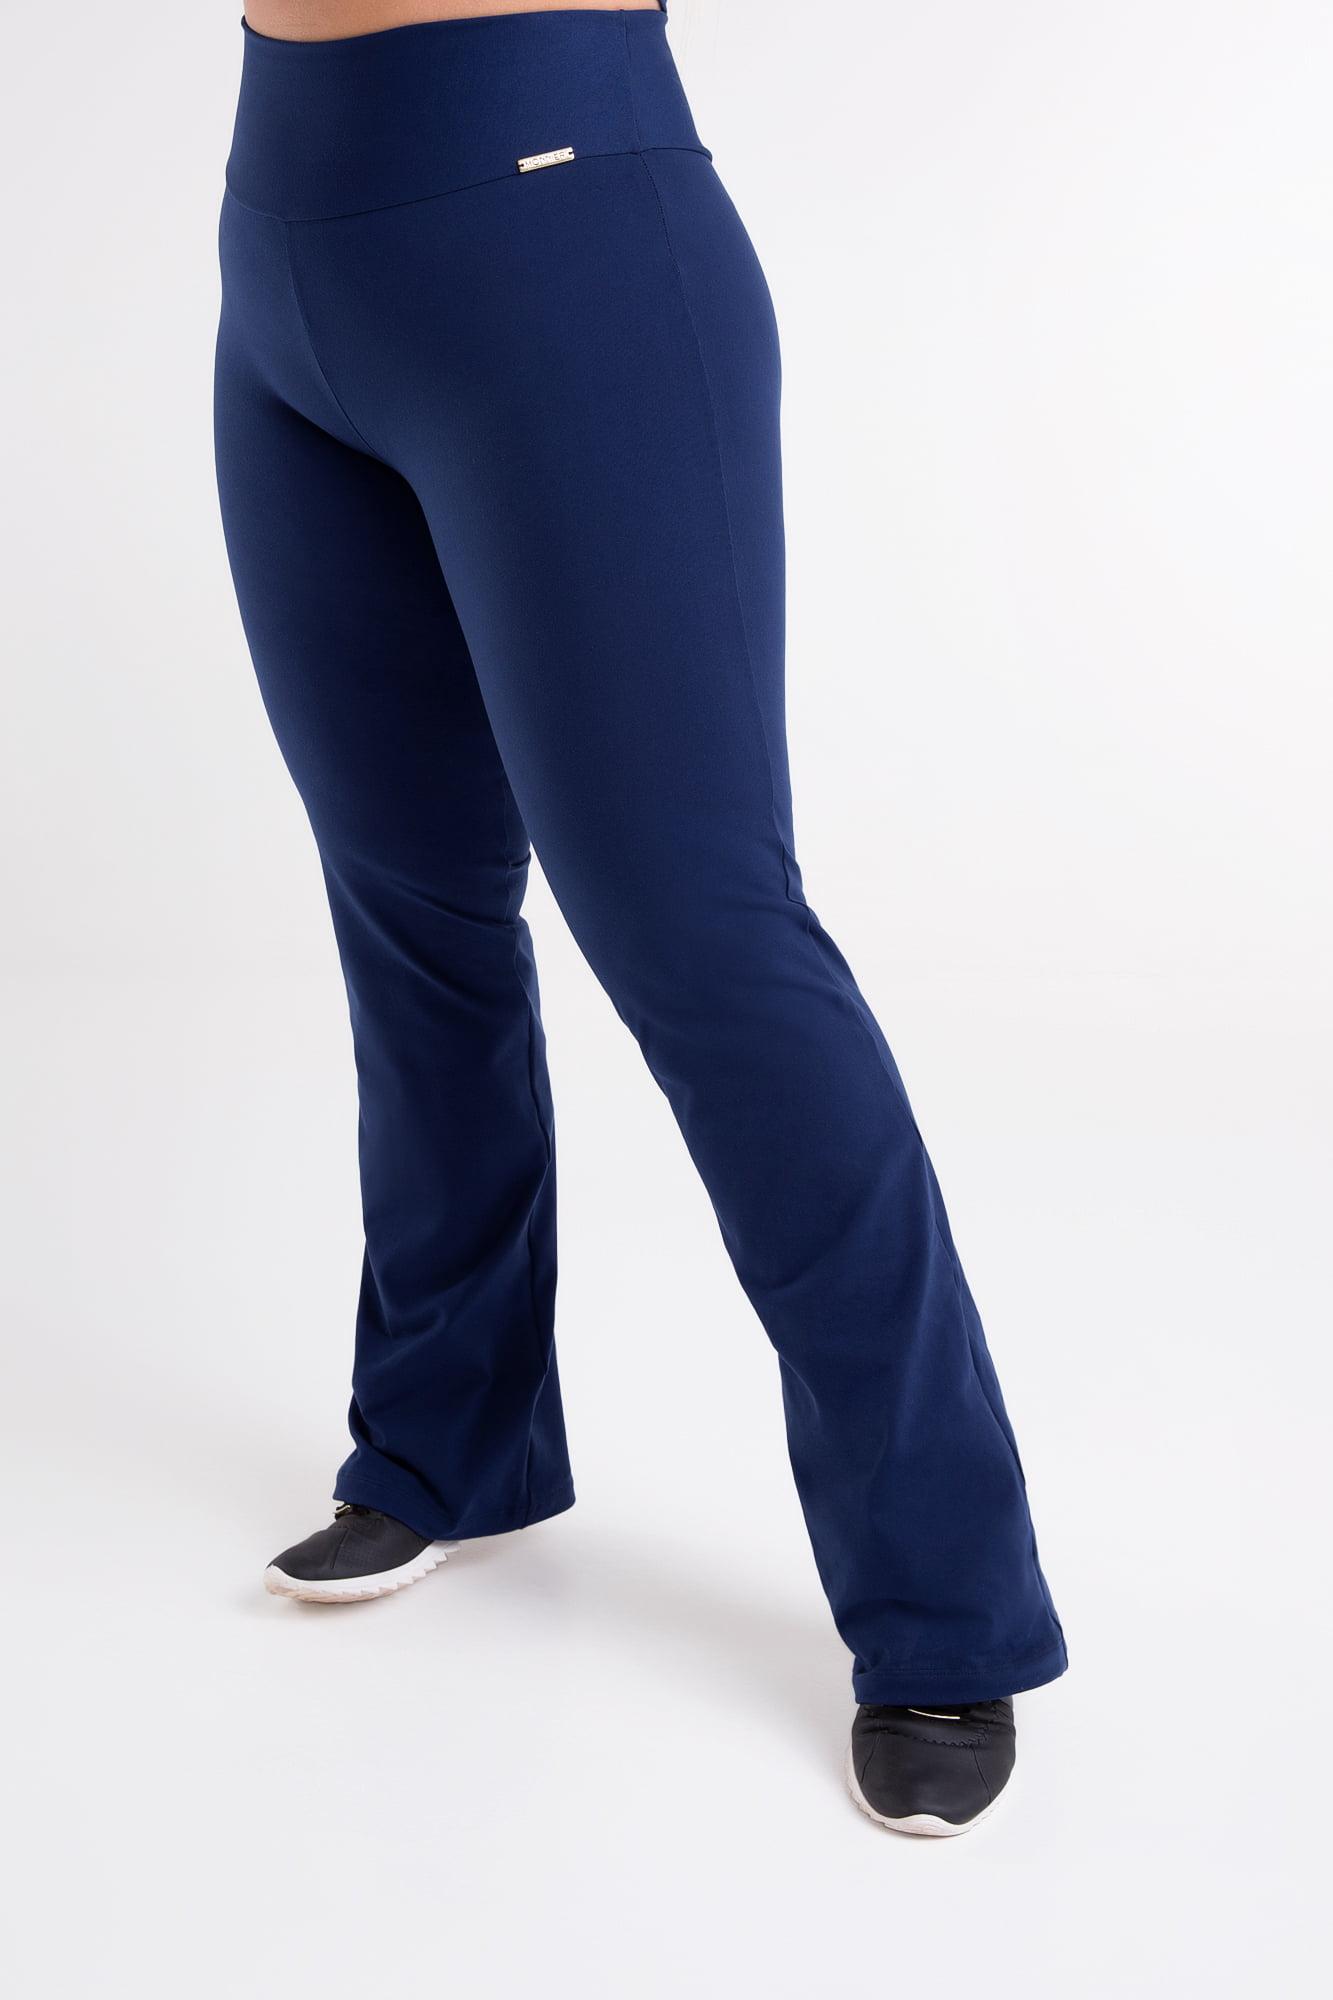 Calça Bailarina Azul Marinho Plus Size